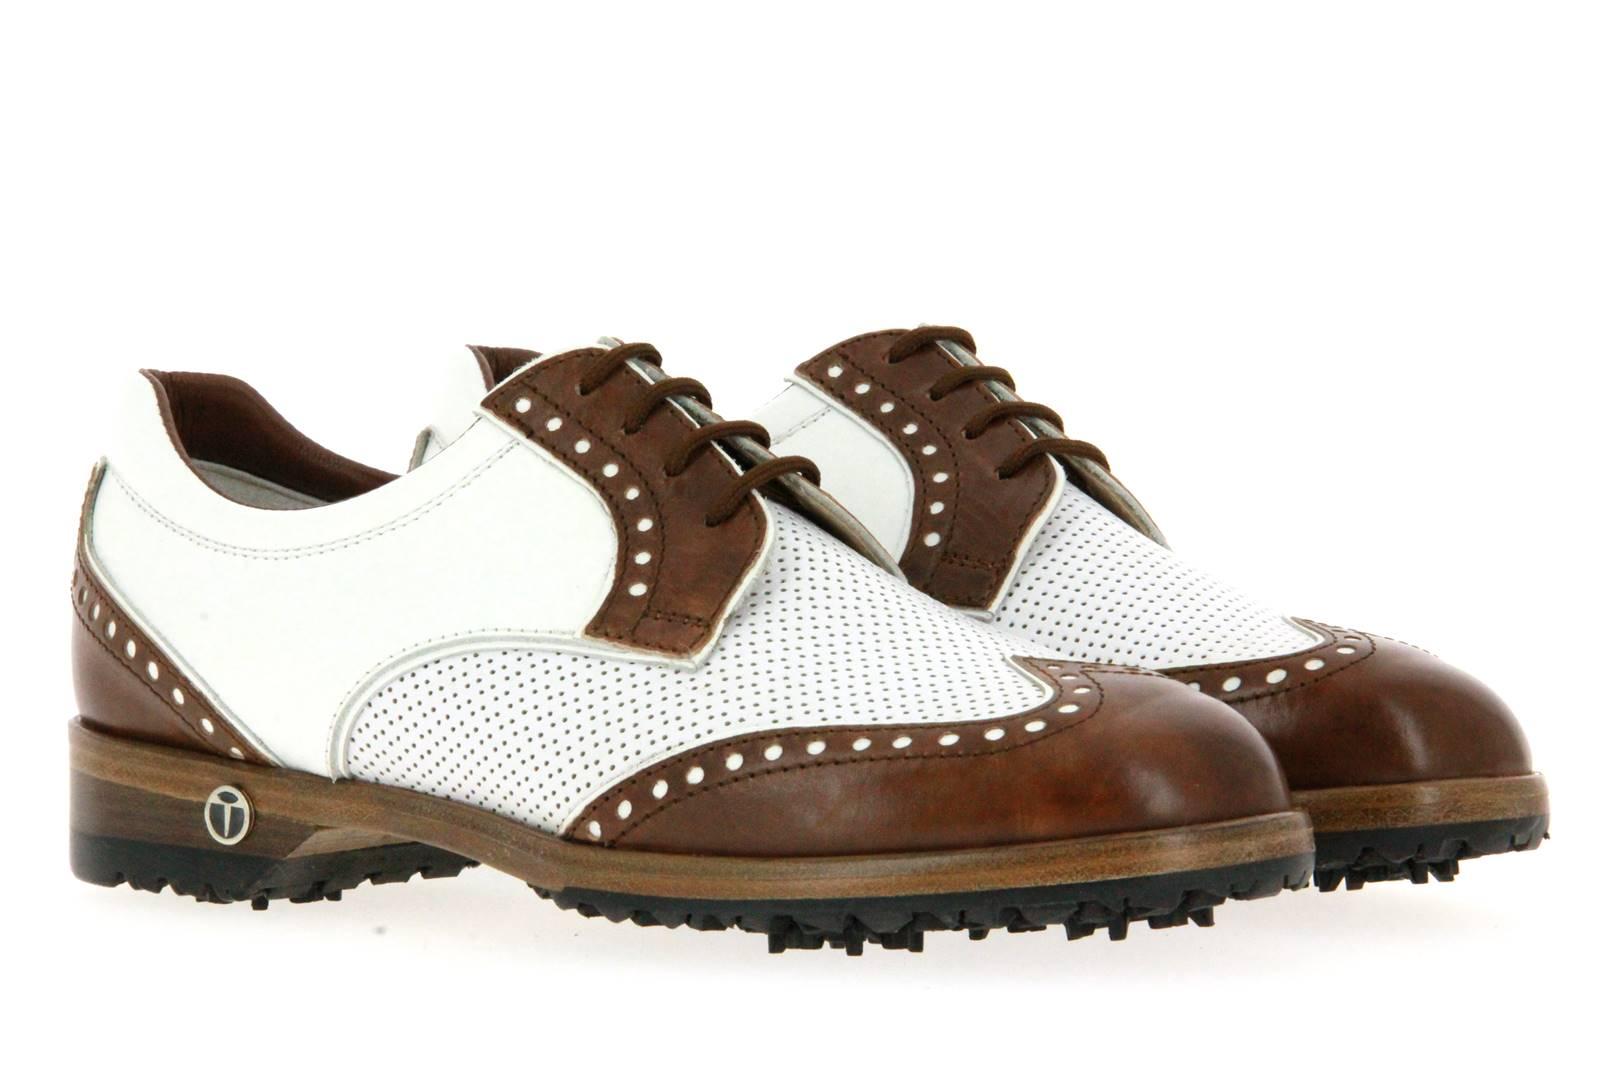 Tee Golf Shoes Damen- Golfschuh SALLY SAPIN BRANDY BIANCO (40½)